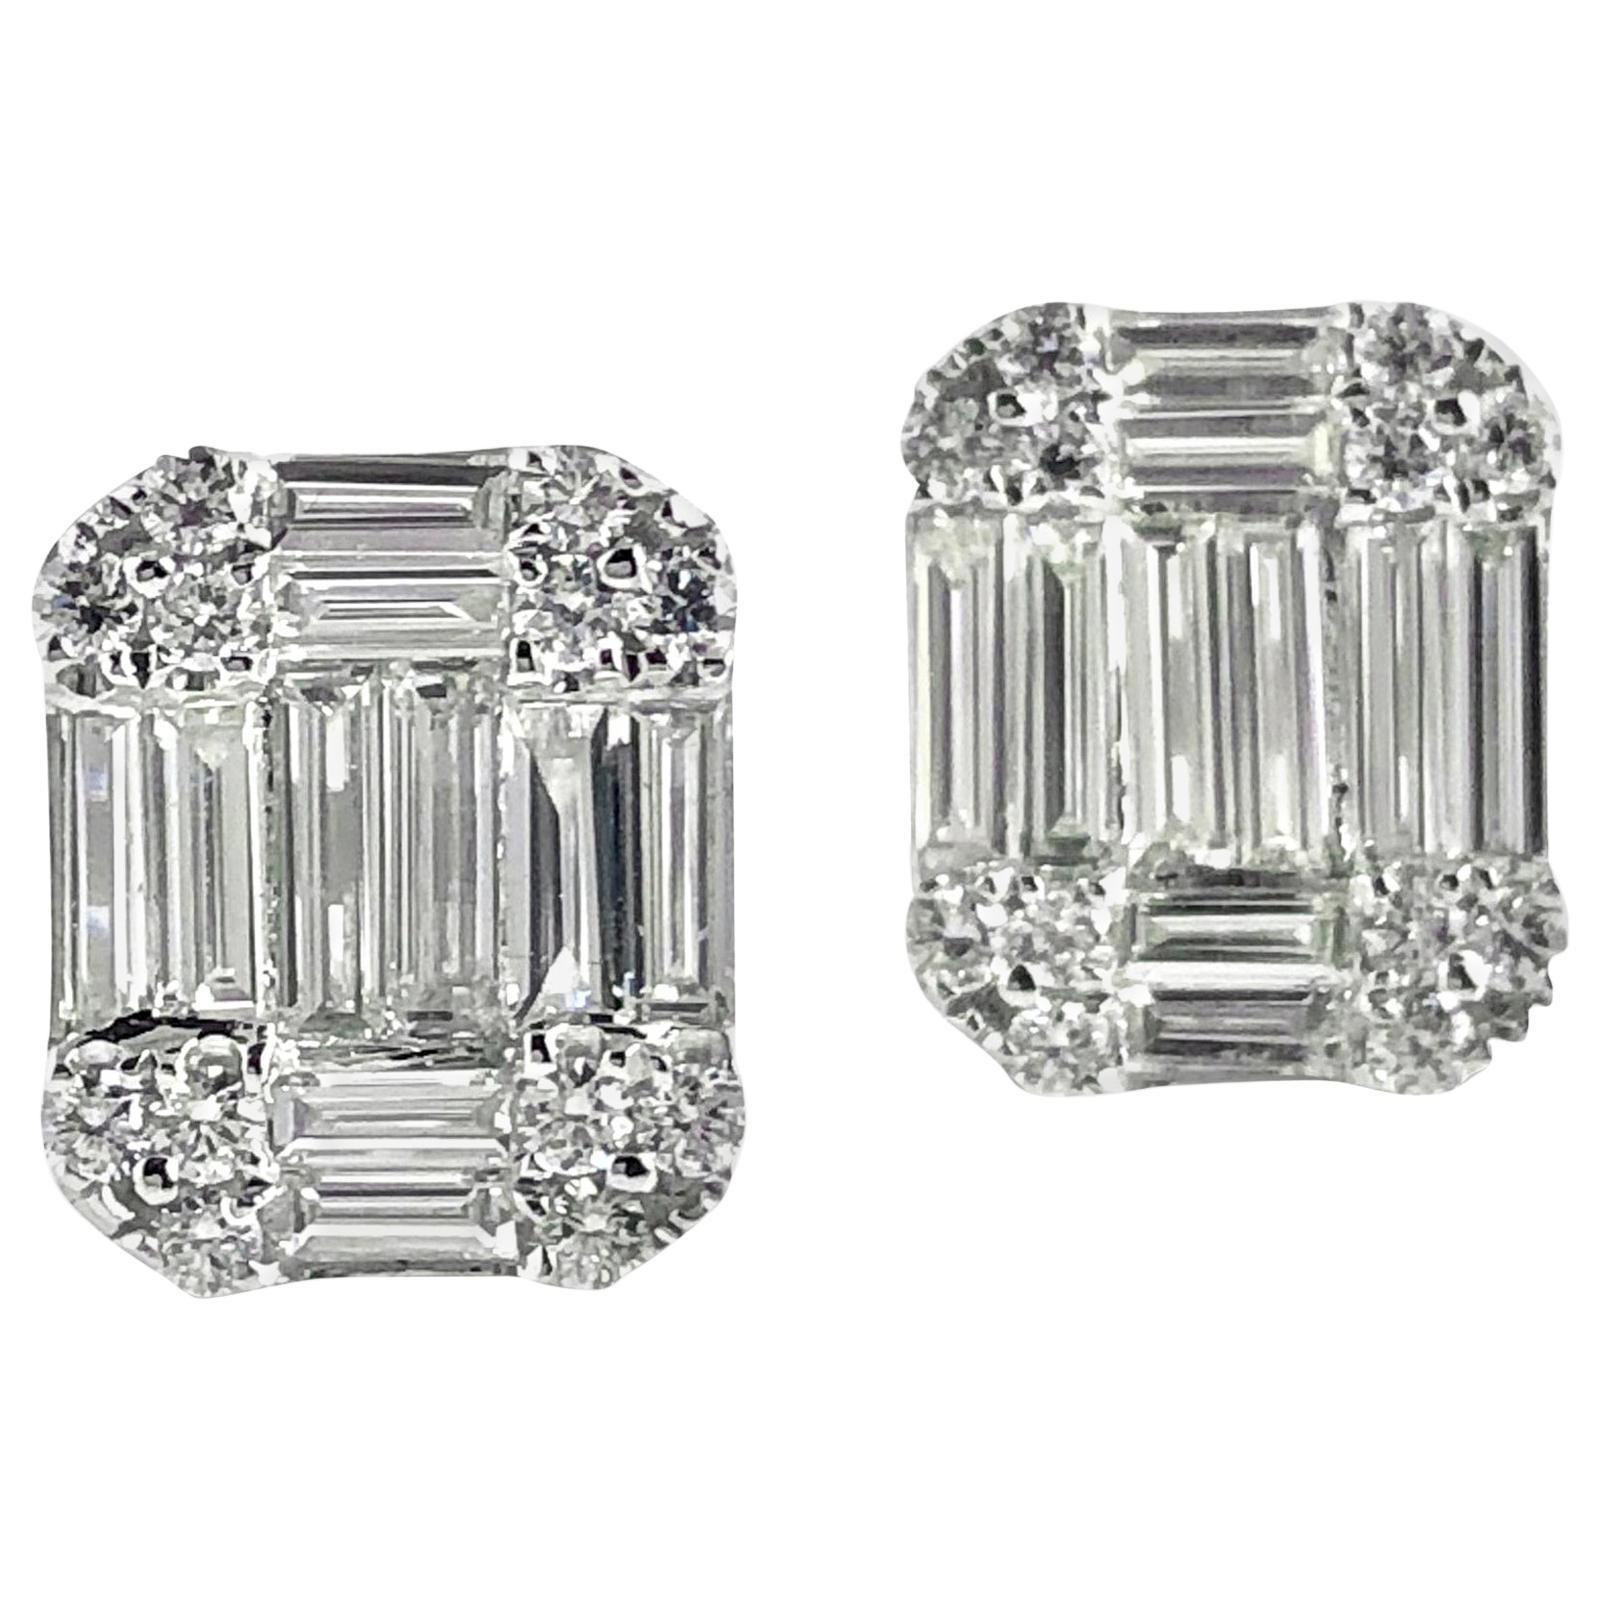 DiamondTown 1.01 Carat Baguette and Round Diamond Earrings in 18K White Gold